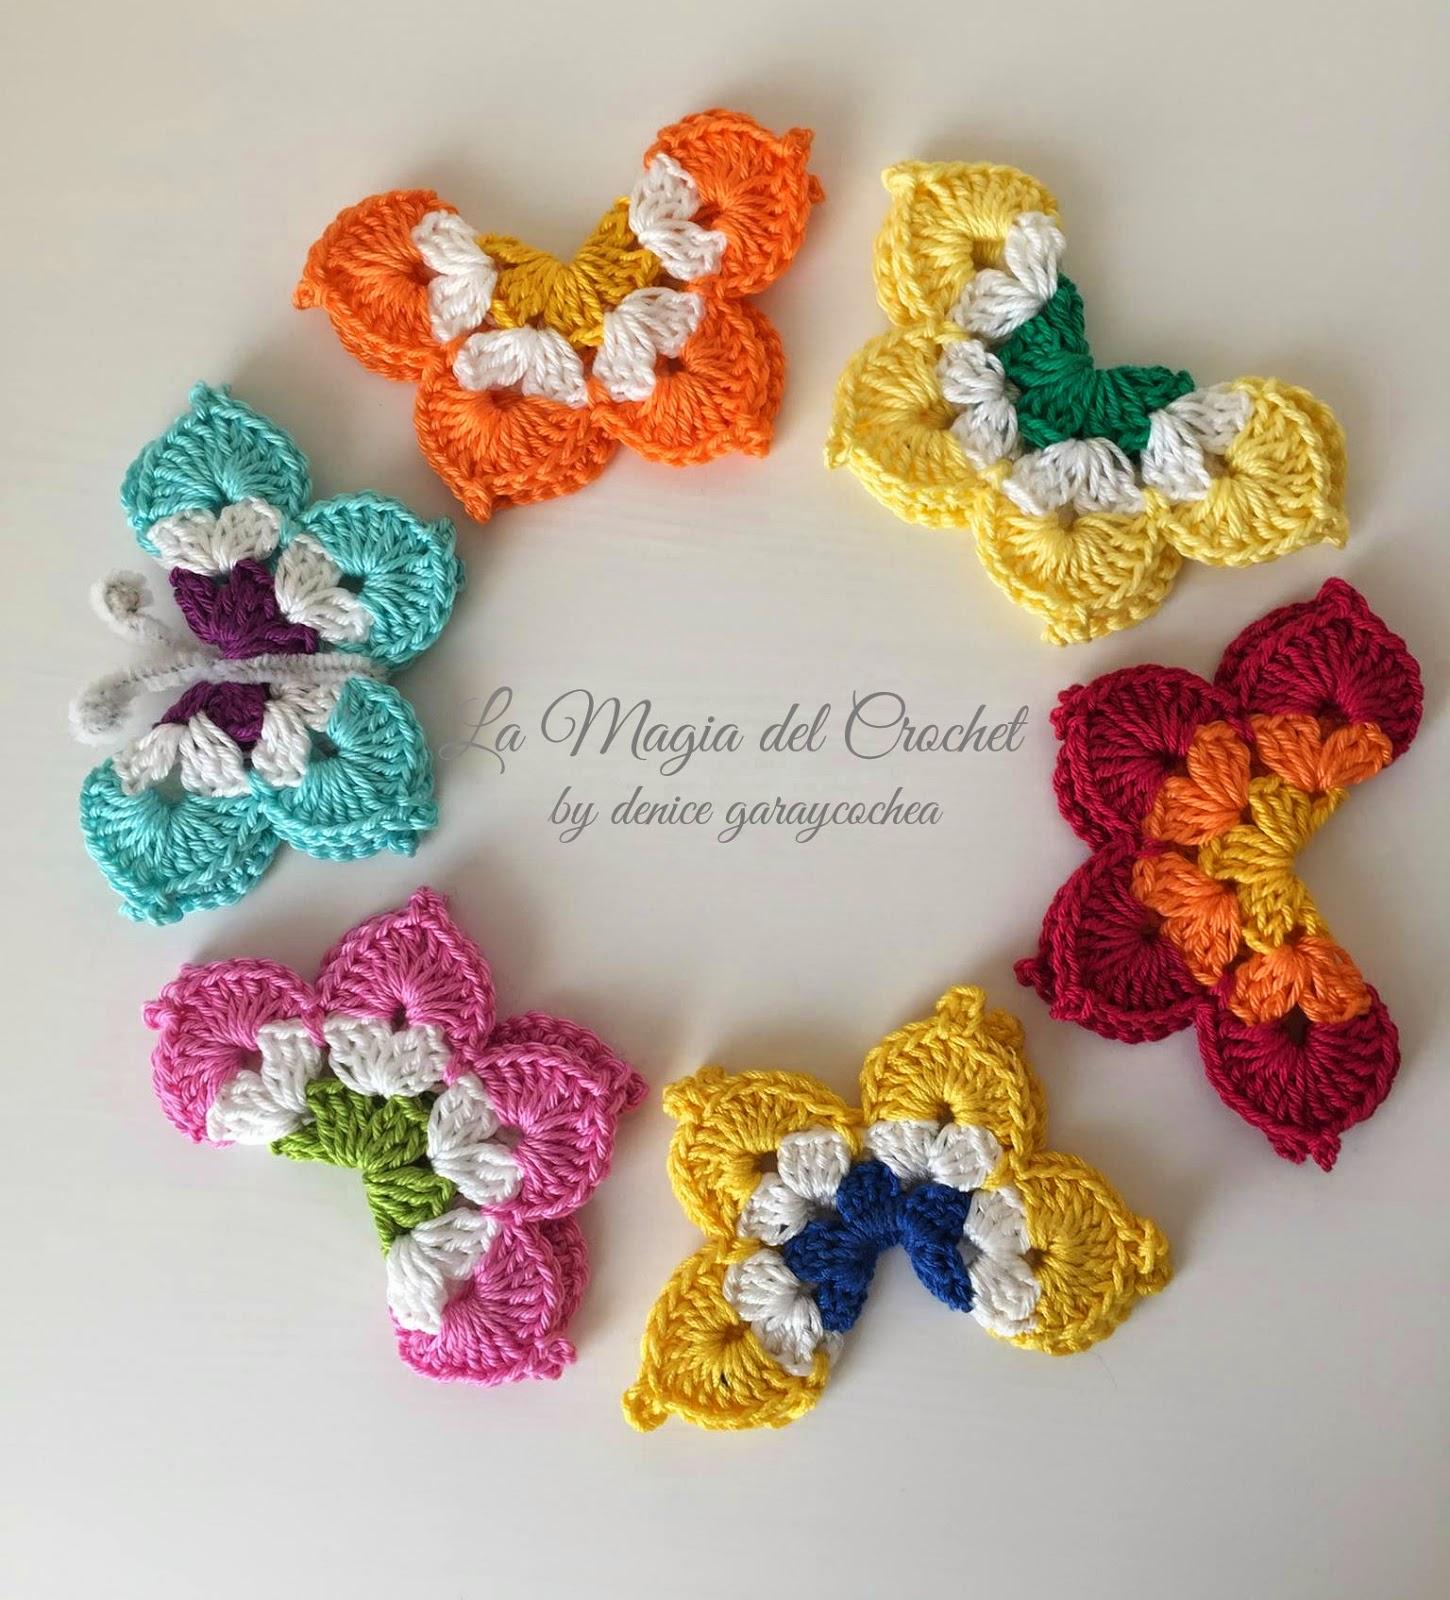 La magia del crochet mariposas a crochet - Cosas de ganchillo faciles ...